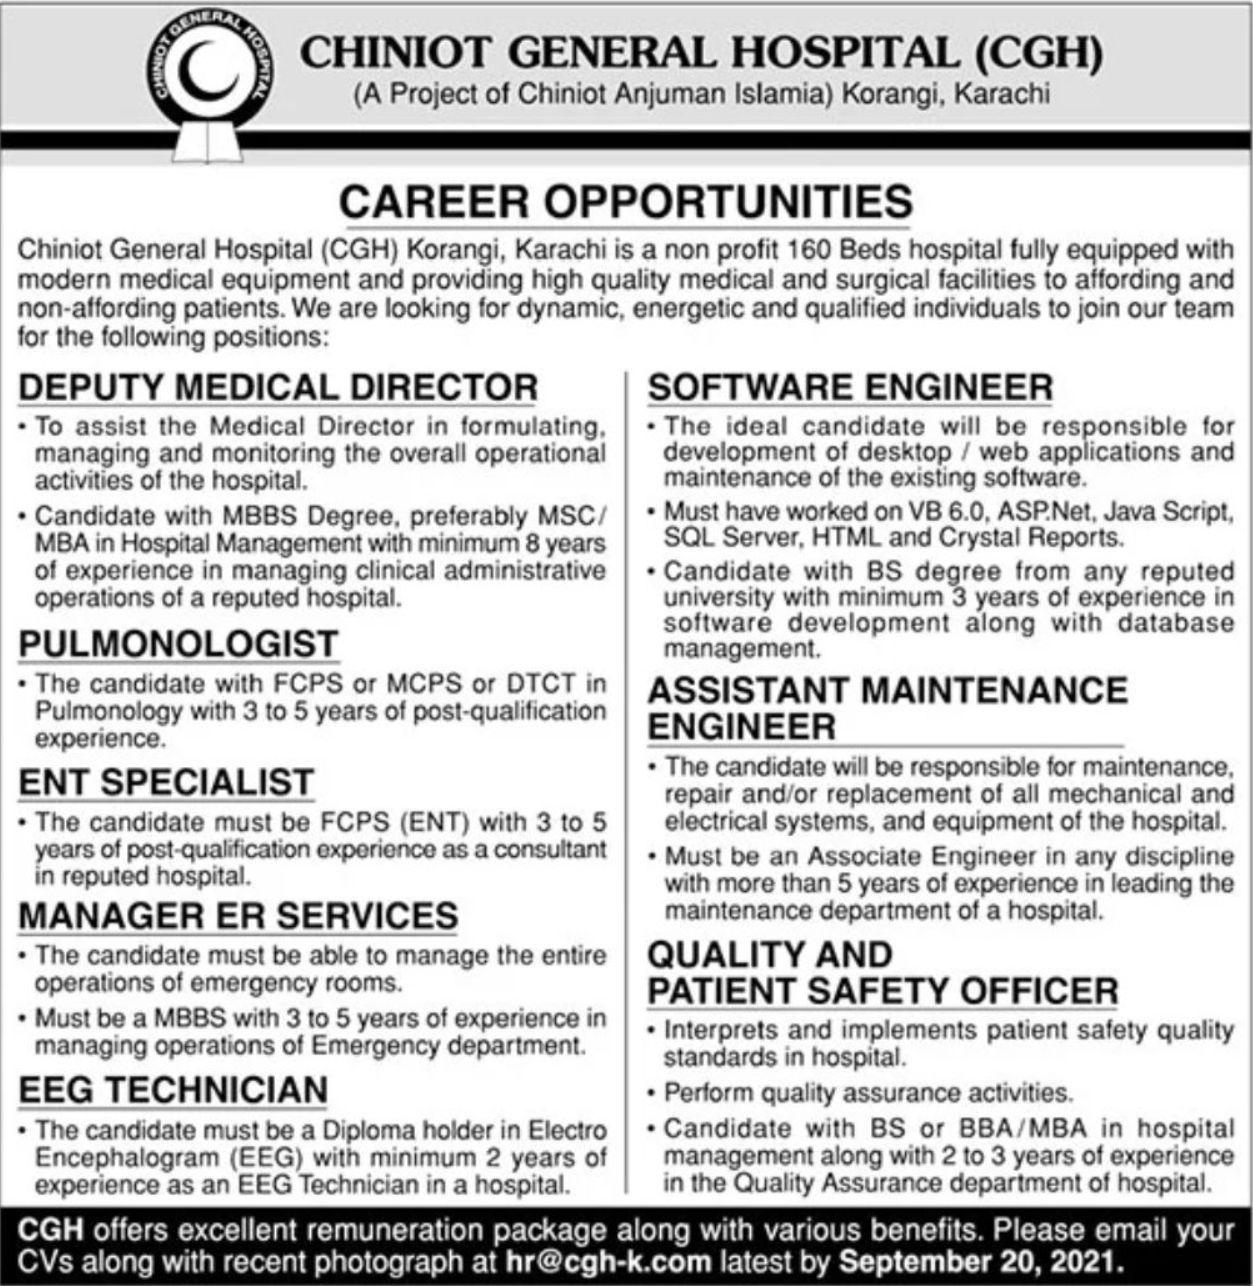 Chiniot General Hospital CGH Vacancies 2021 – Dailyjobs.pk 3